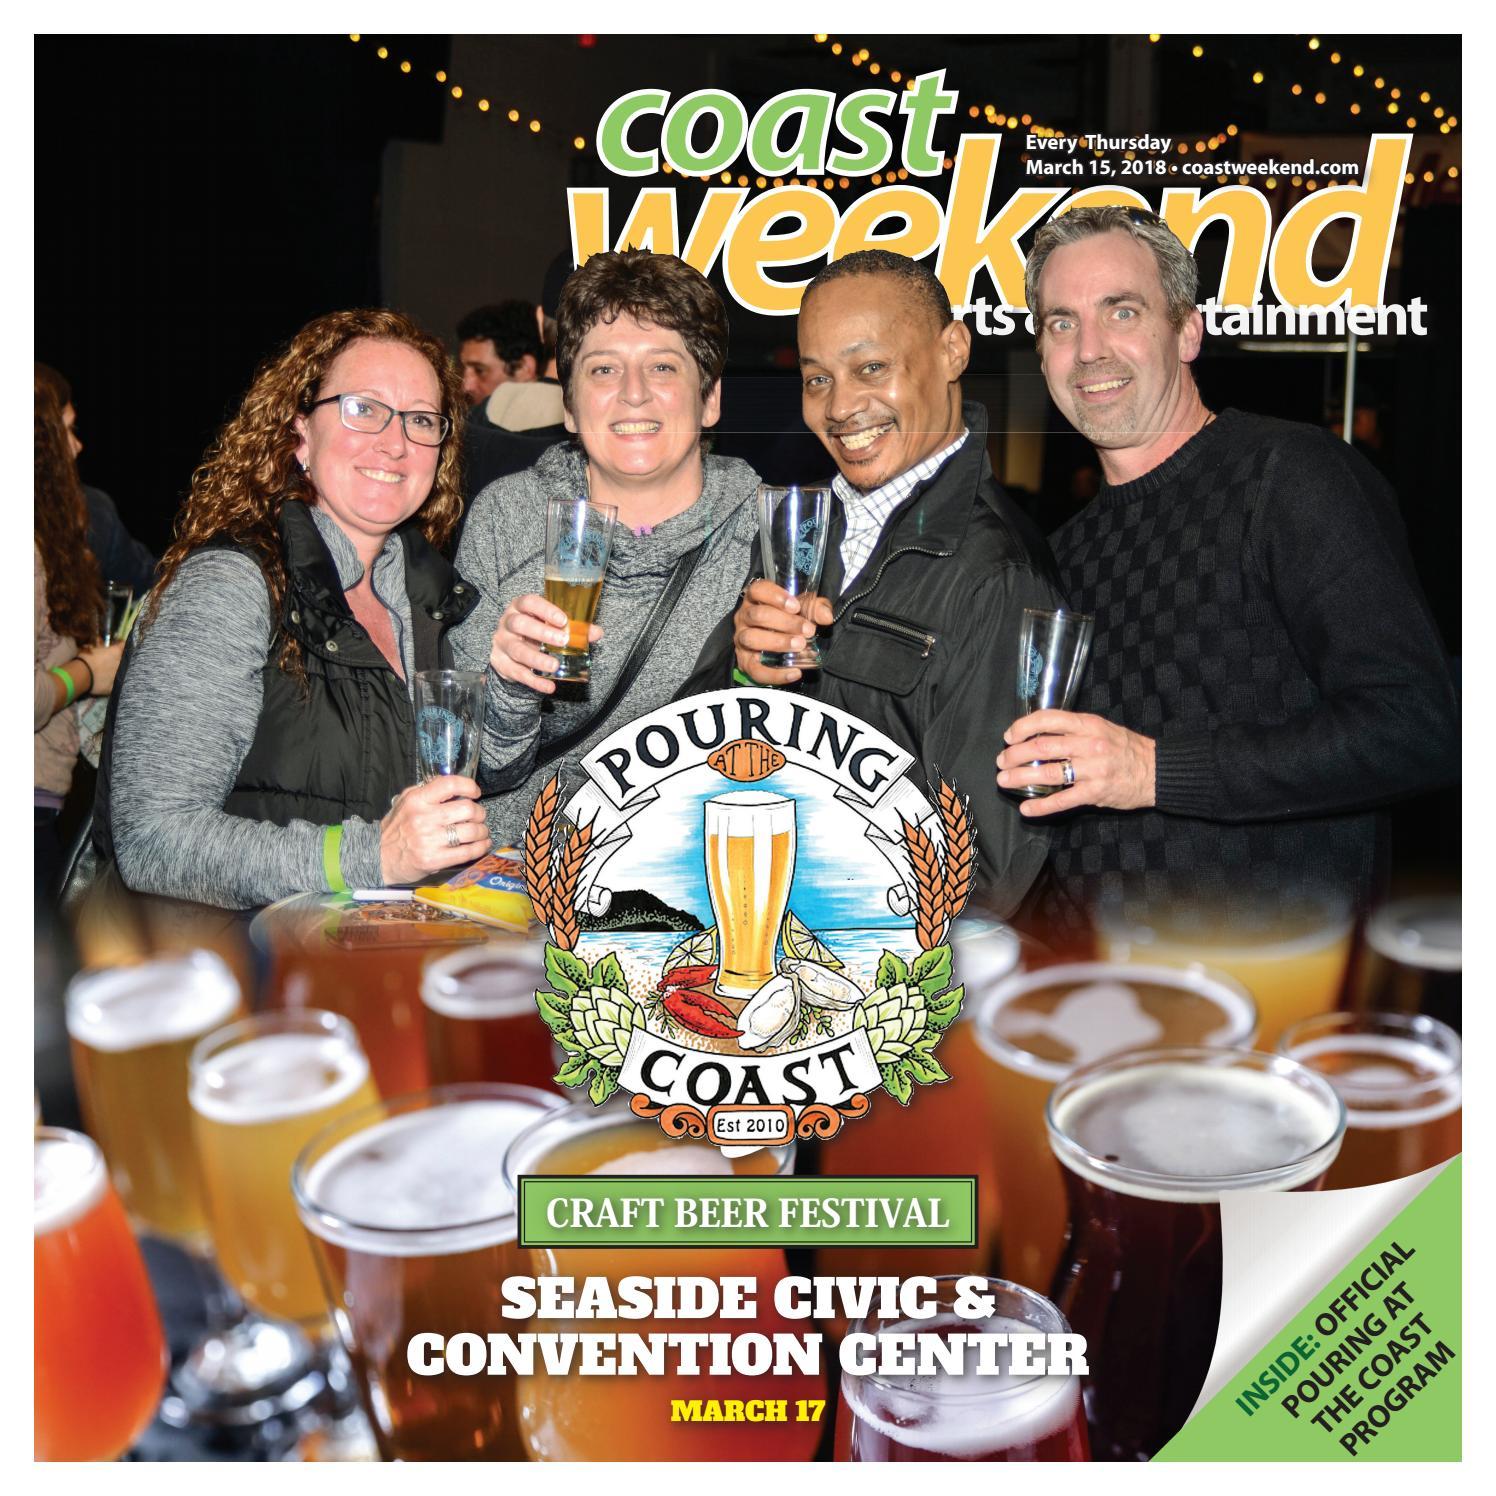 Coast Weekend March 15, 2018 by Our Coast - issuu